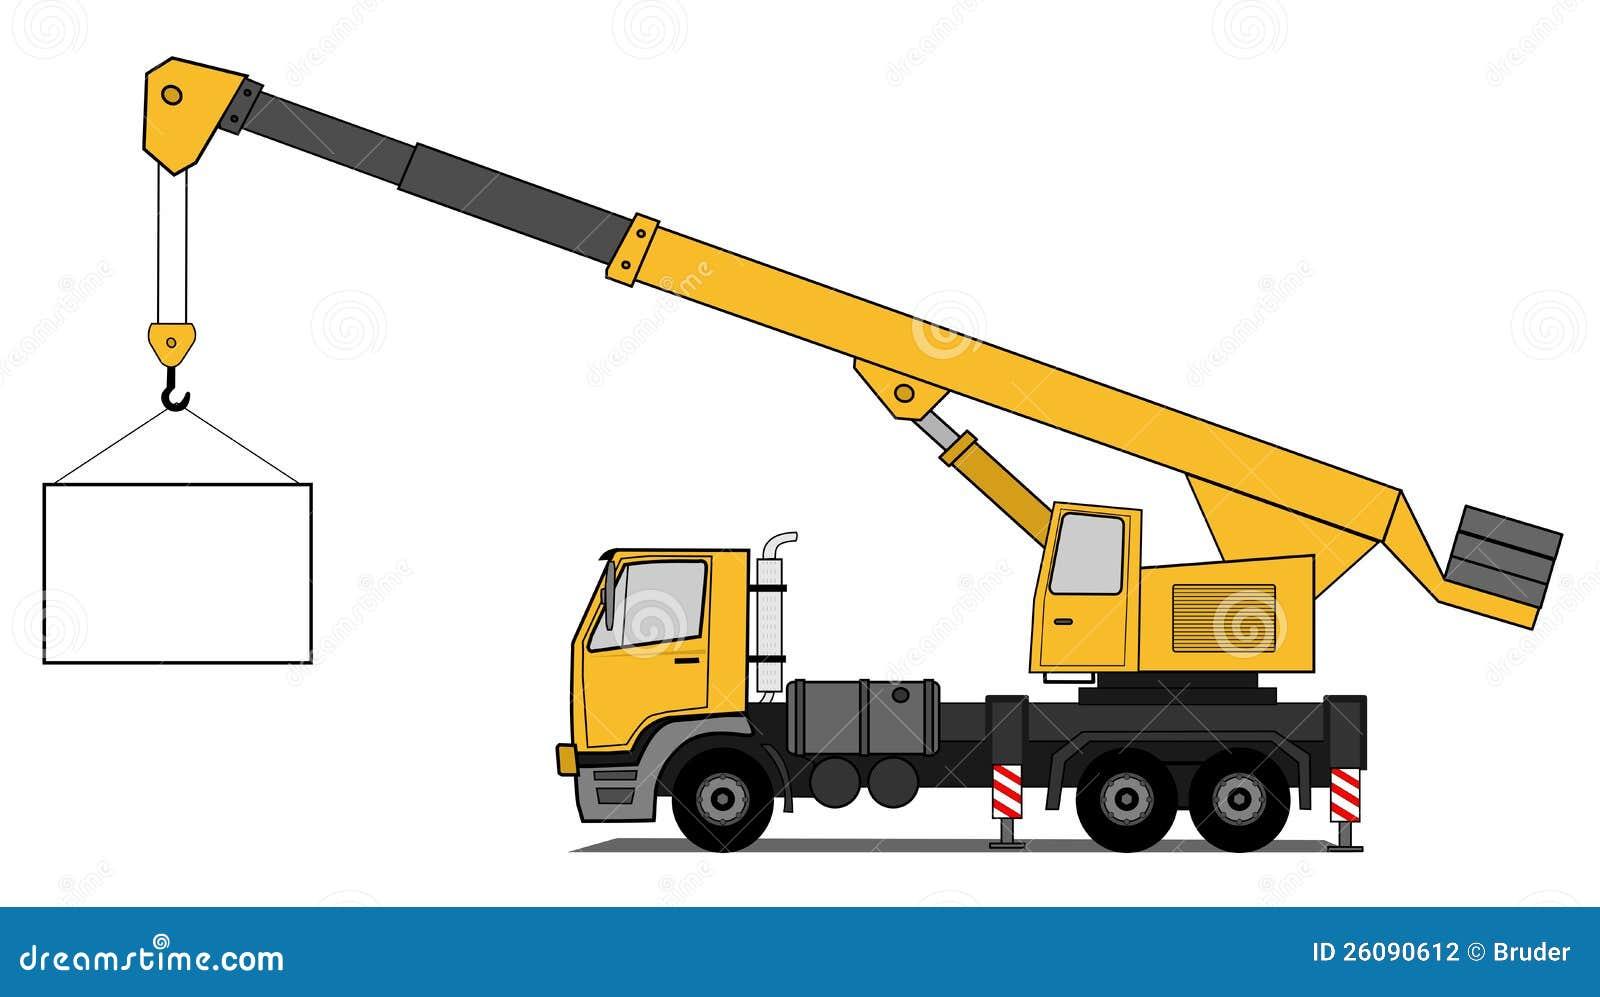 Crane Truck Stock Photography - Image: 26090612